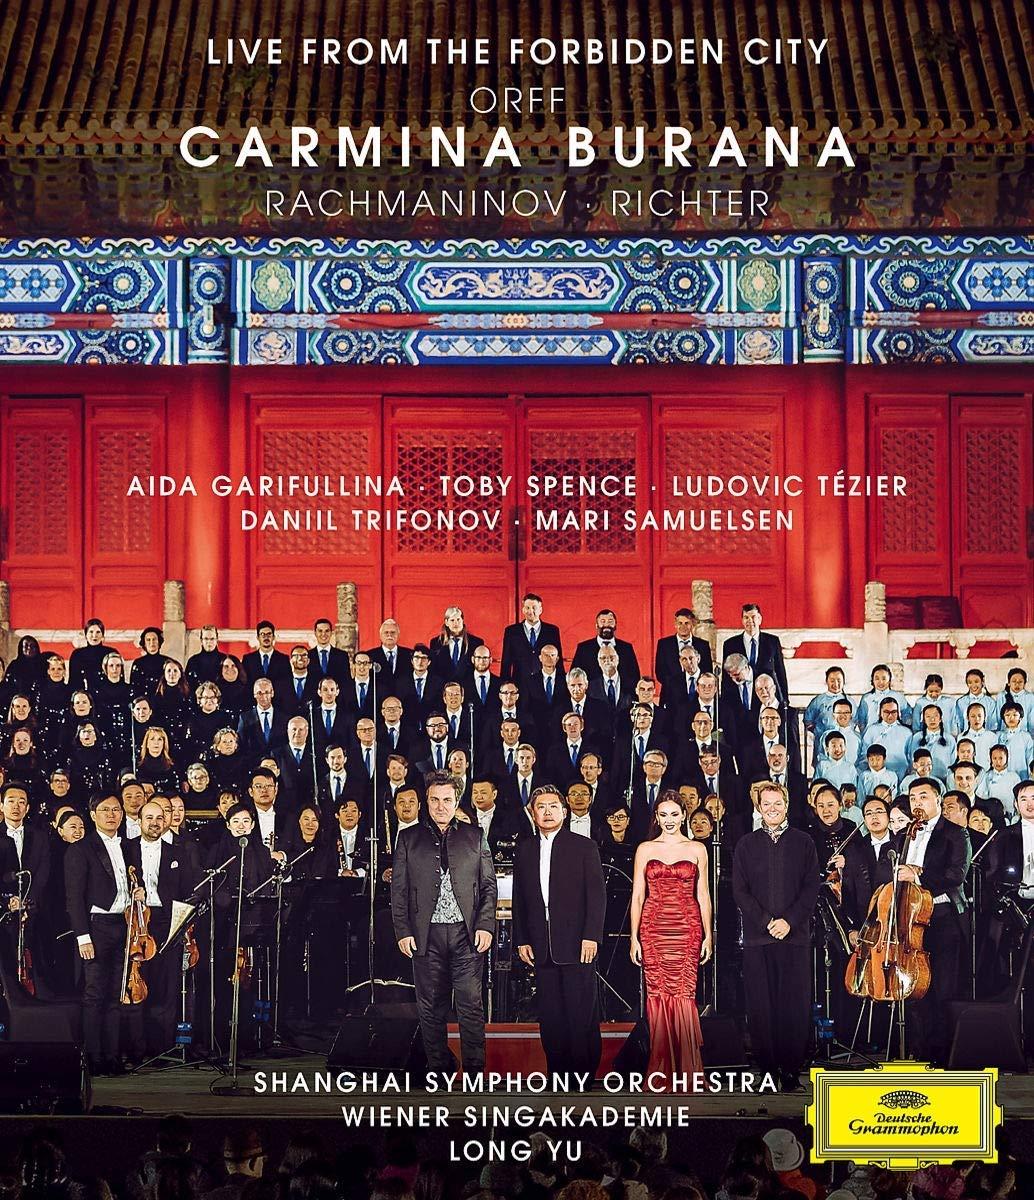 Orff - Carmina Burana. Rachmaninov. Richter (DVD)